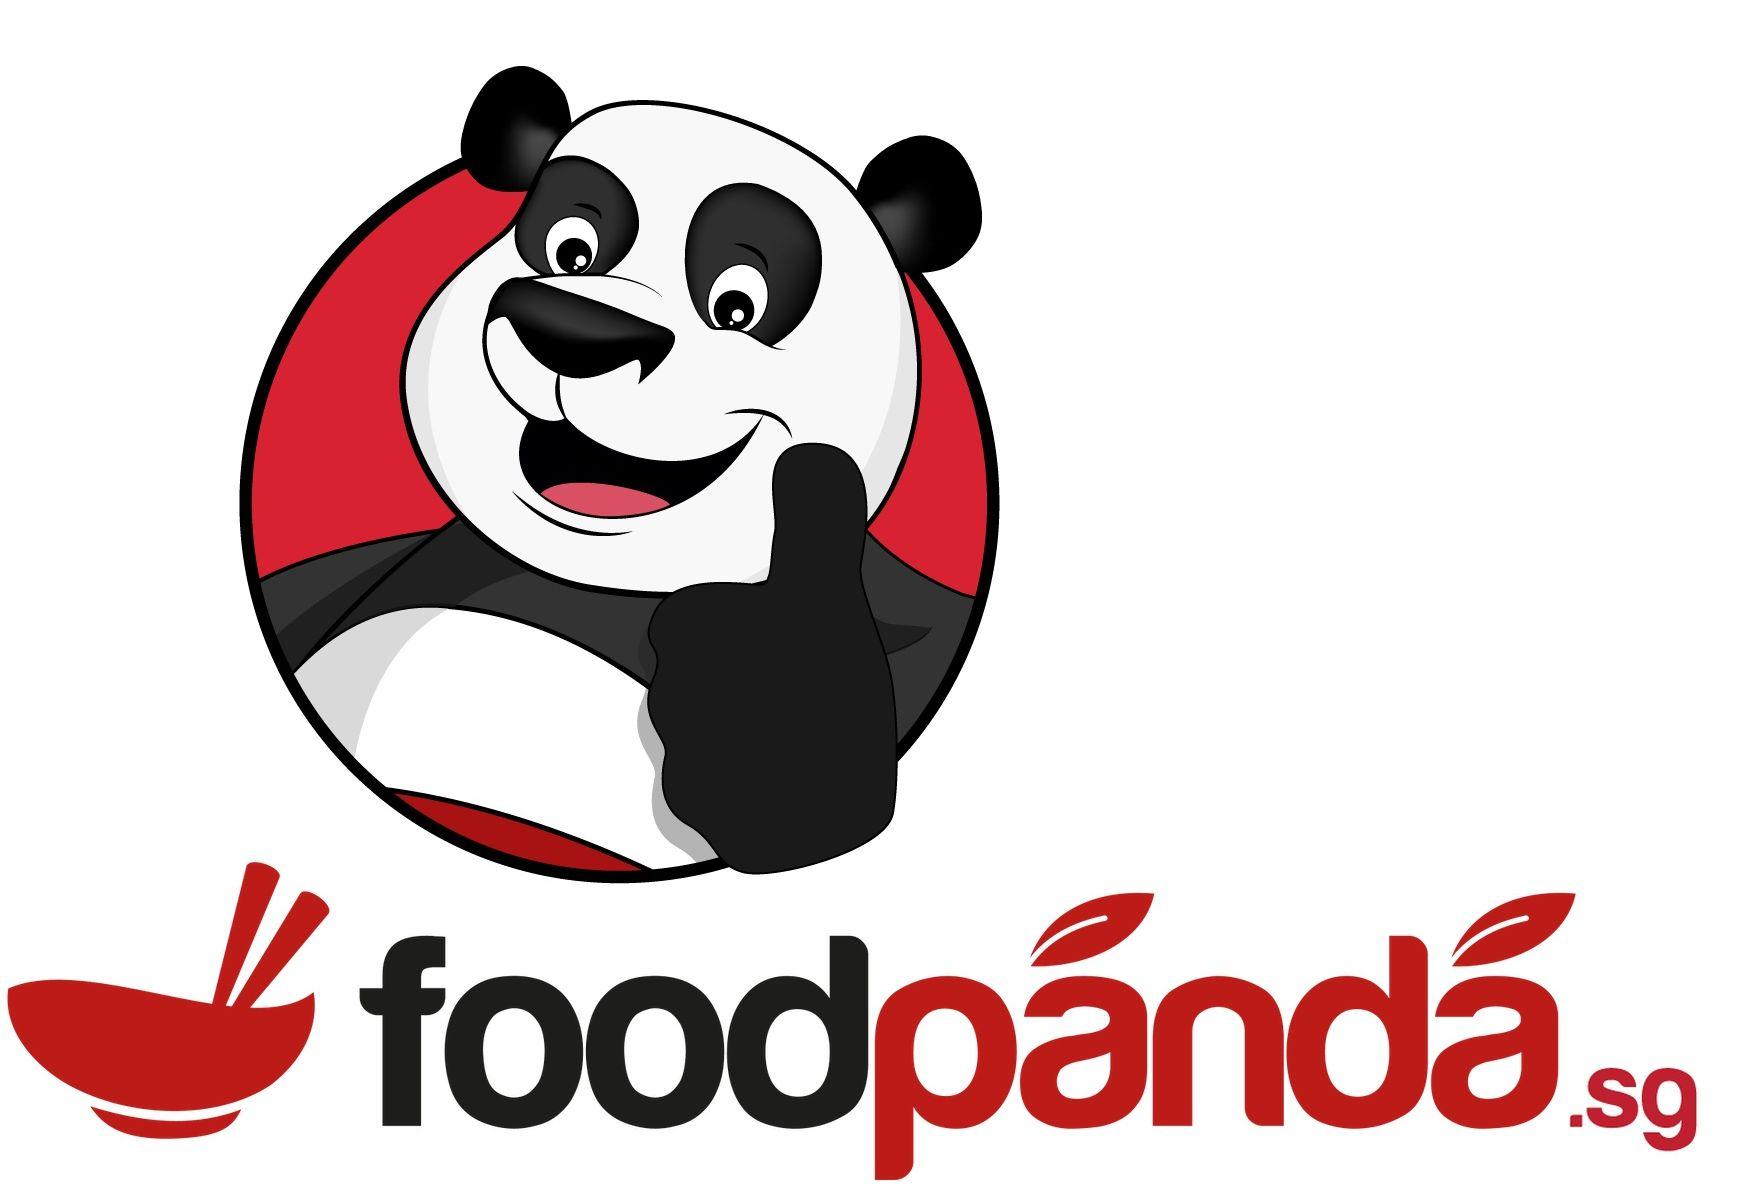 foodpanda.sg u2013 The Chosen Glutton : Singapore Blog